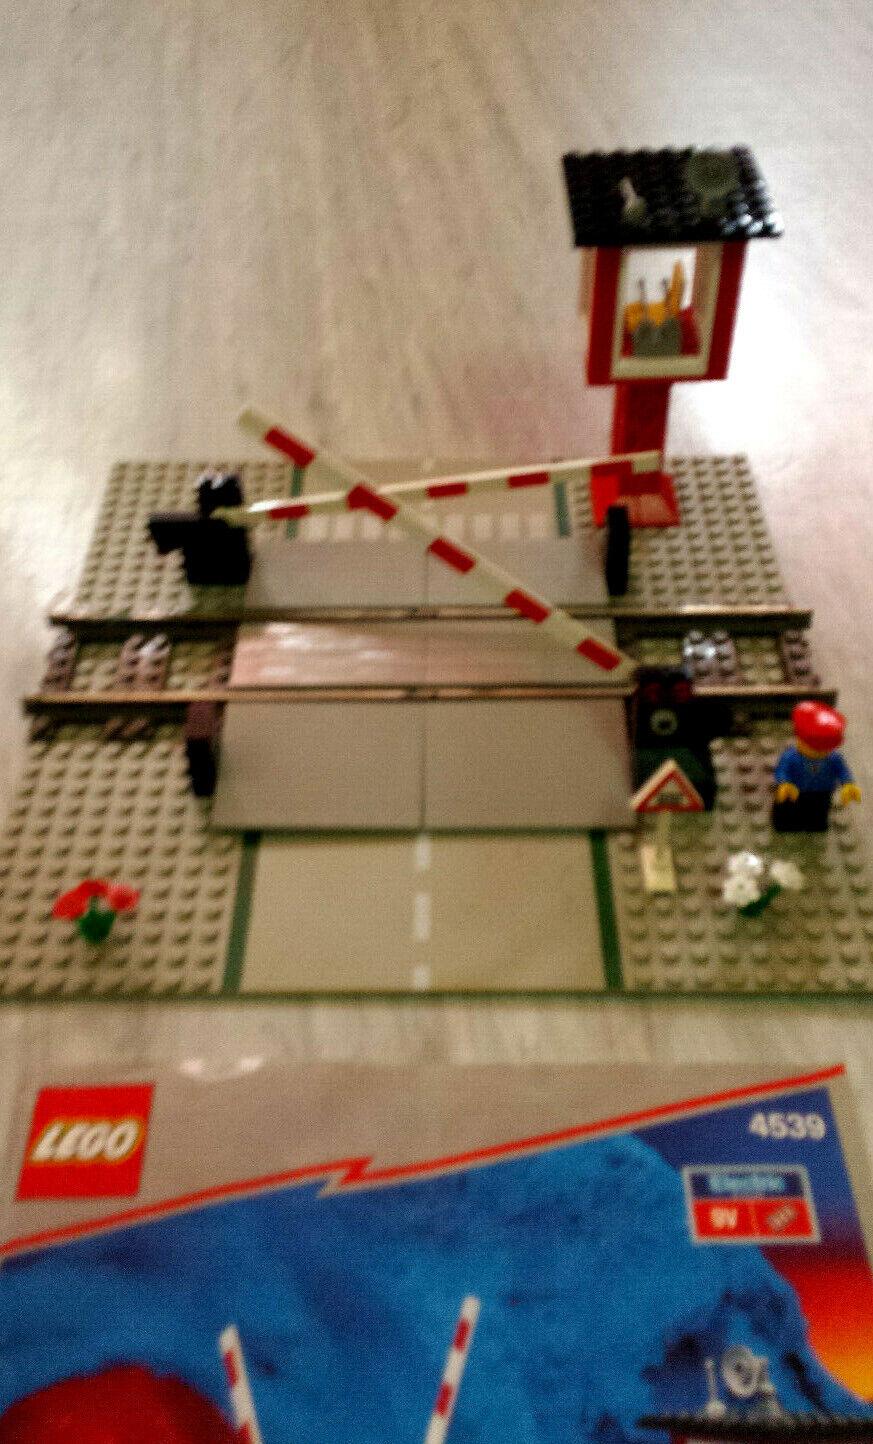 Lego 4539 - Bahnübergang 9V komplett mit Wärter- Haus Schranken Bauplan